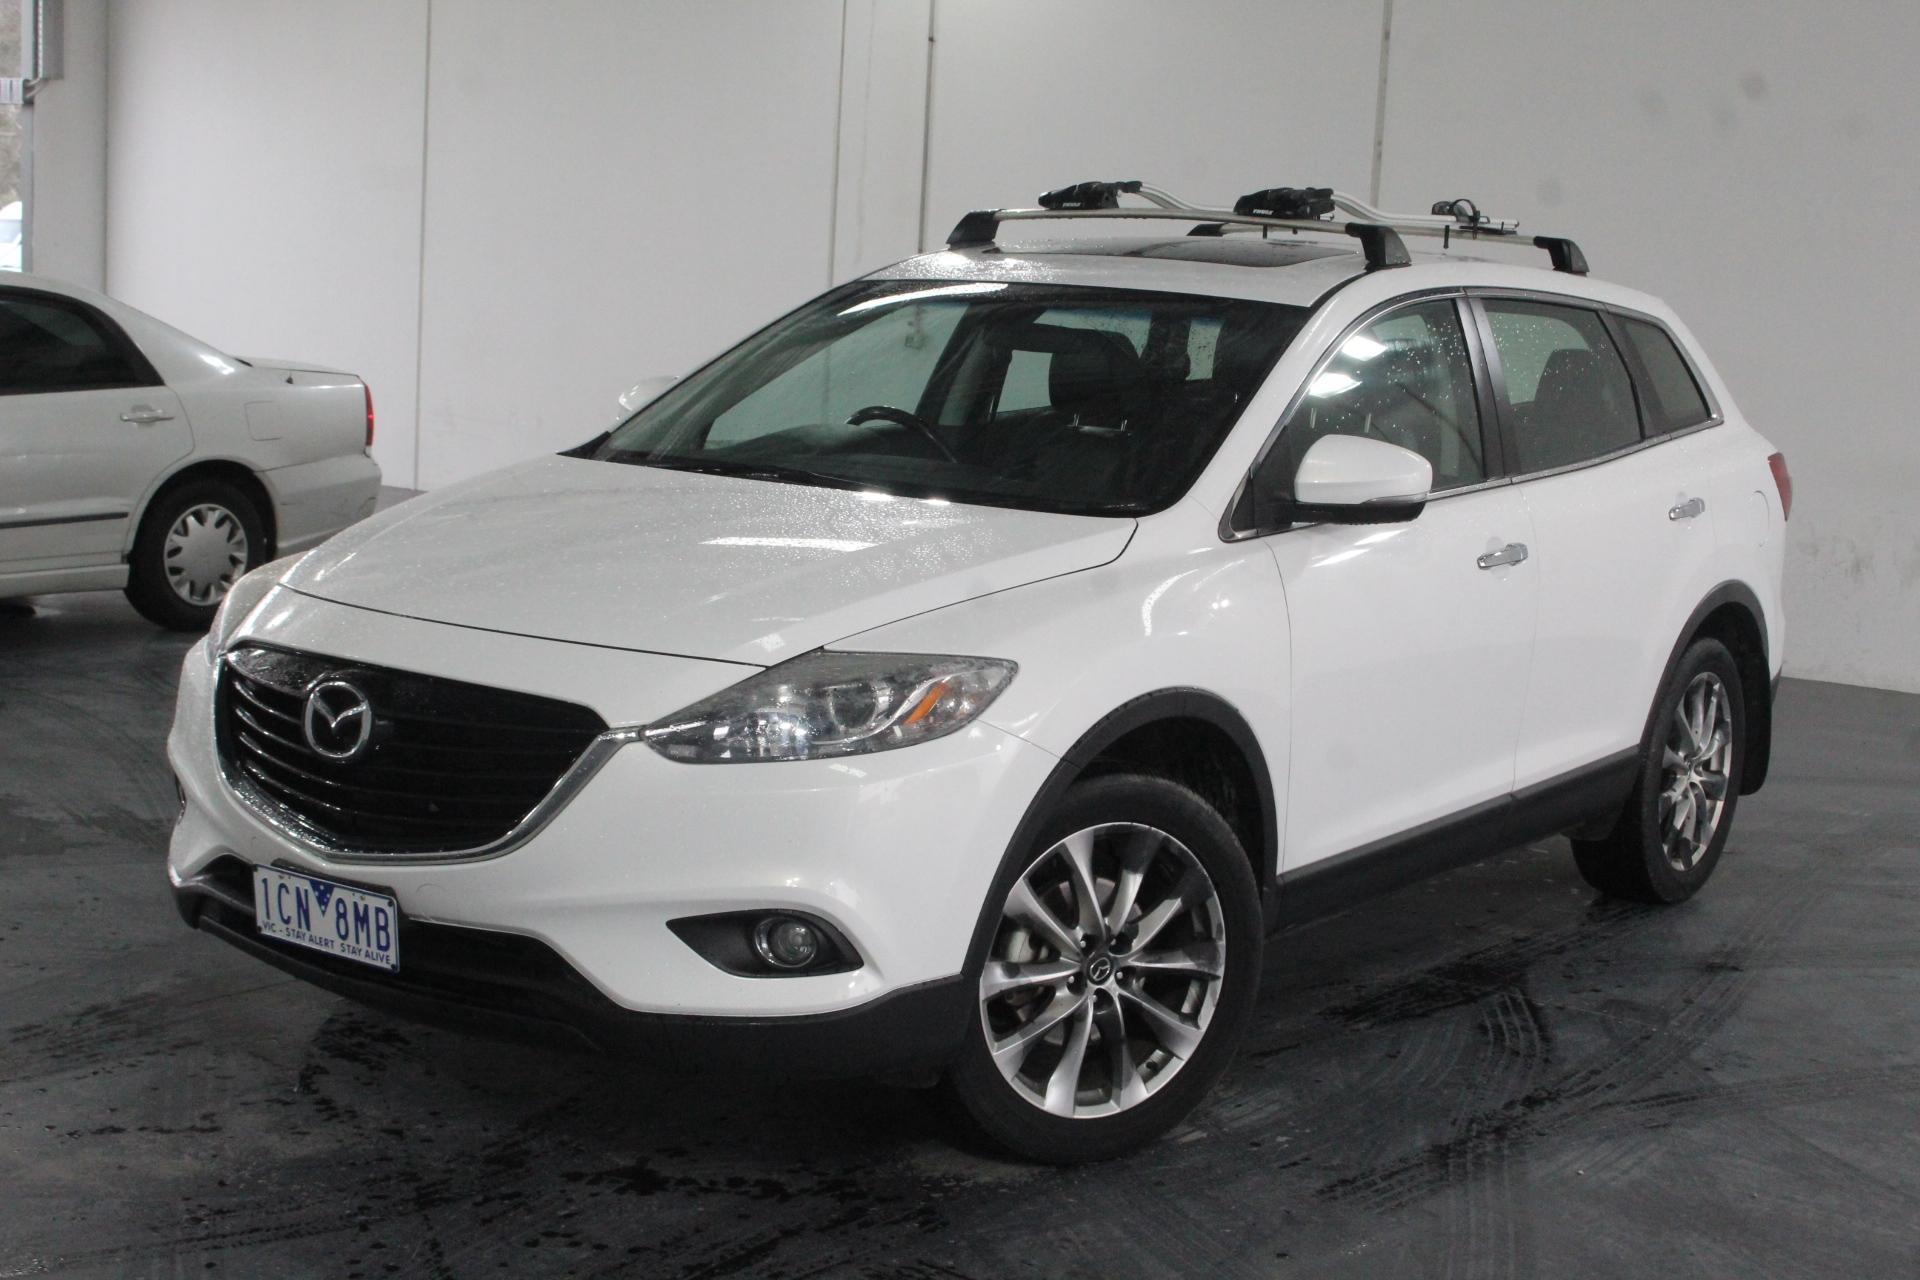 2014 Mazda CX-9 Luxury (FWD) Automatic 7 Seats Wagon